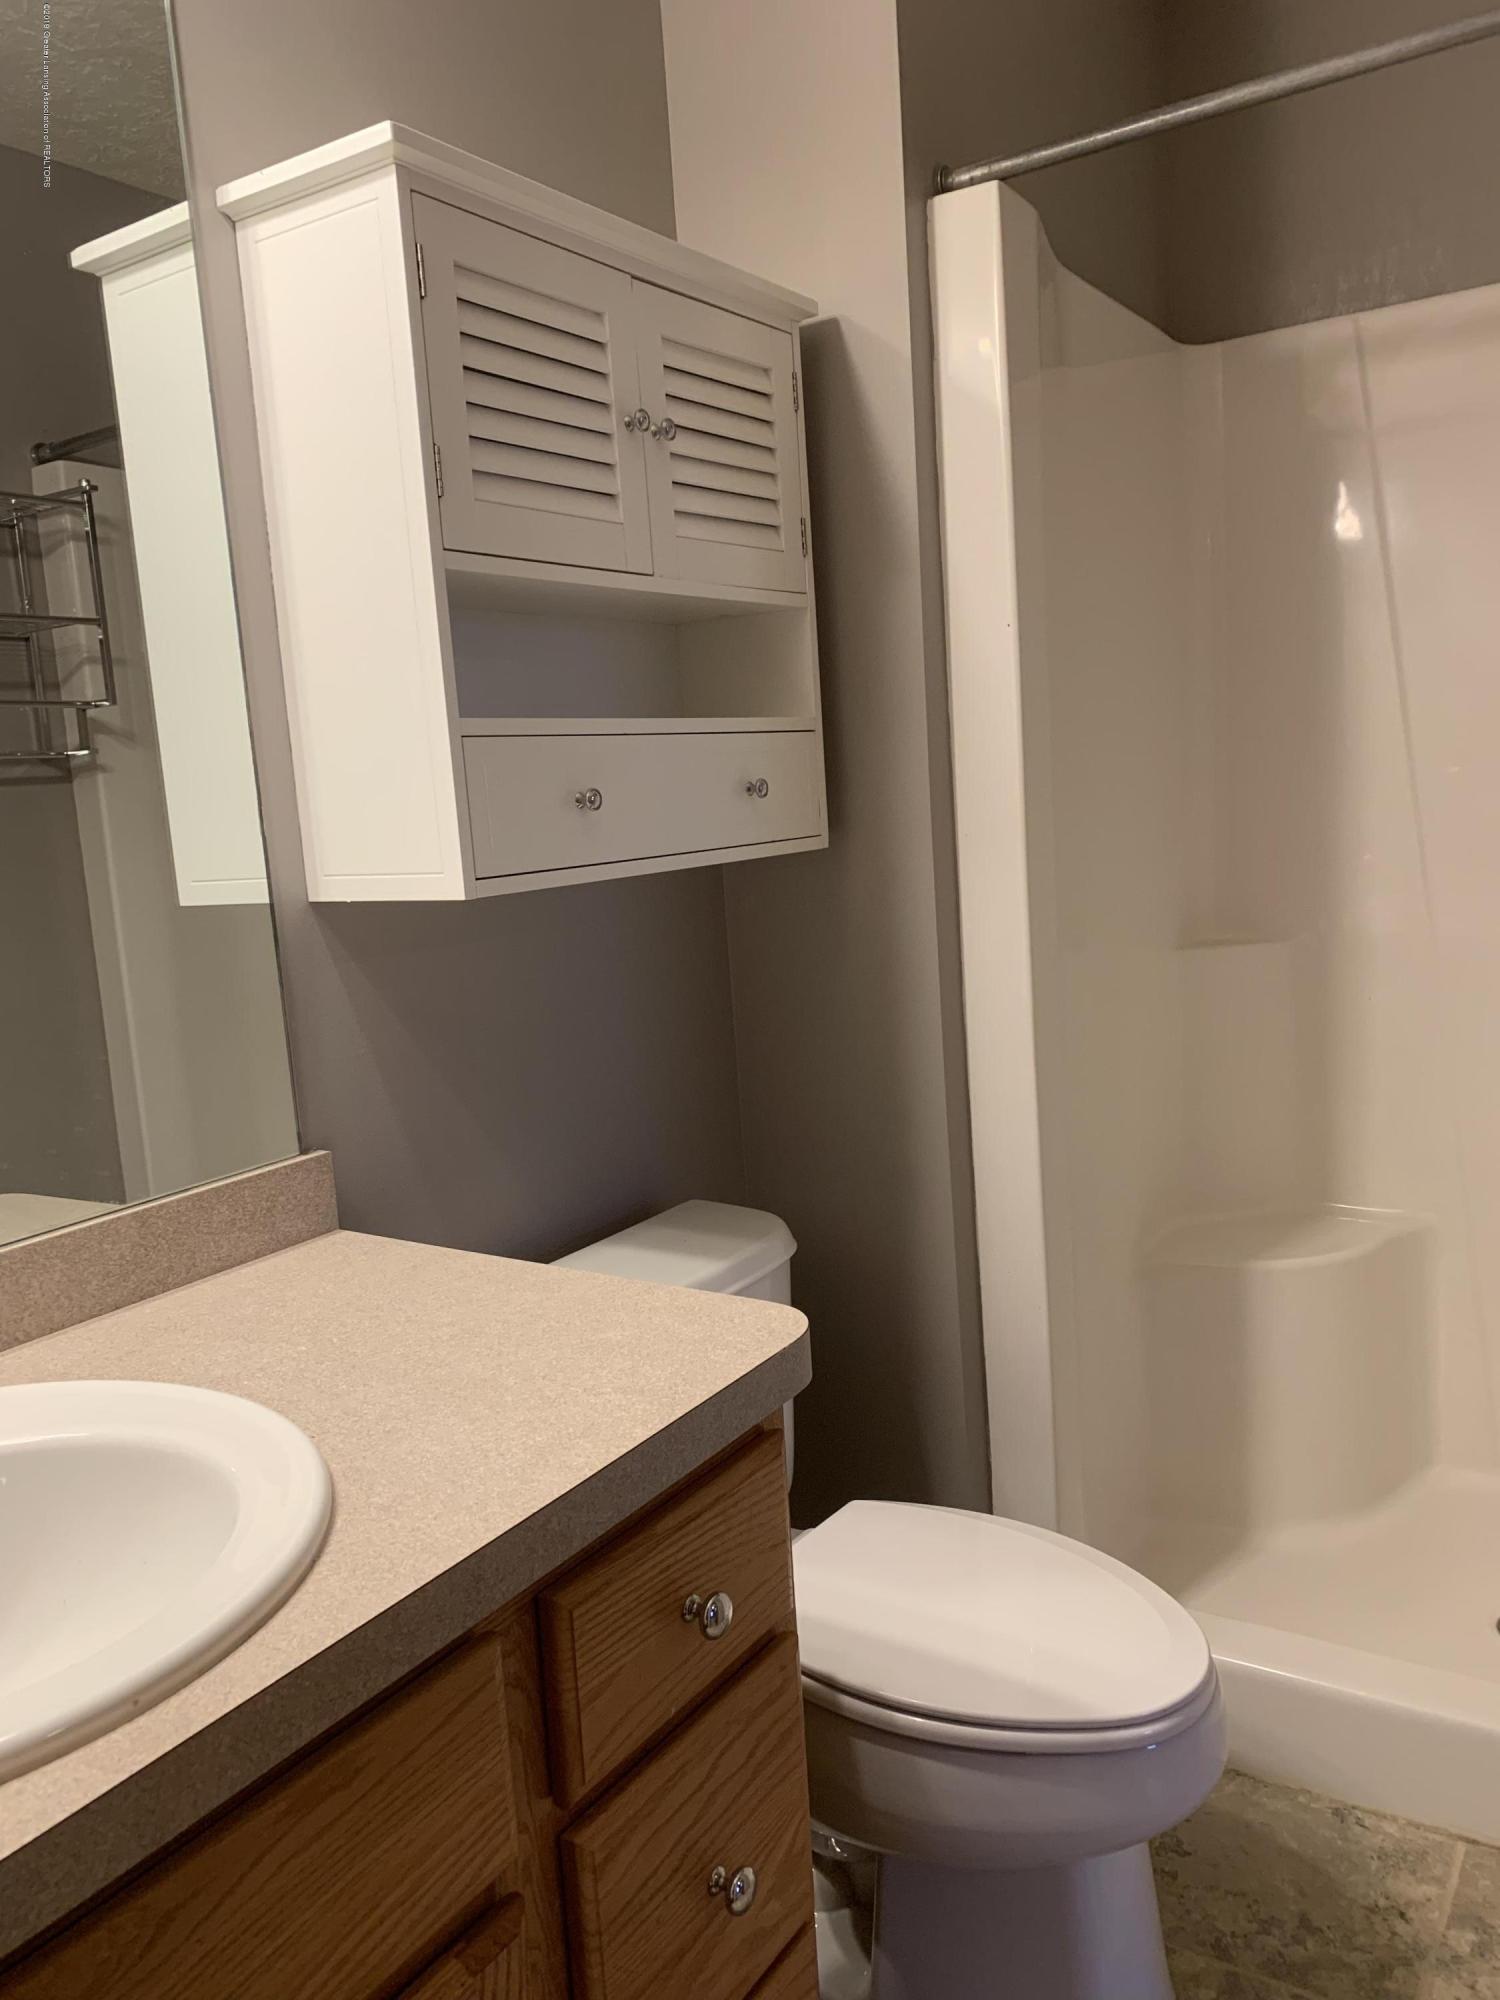 14705 Hardtke Dr - Bathroom - 44